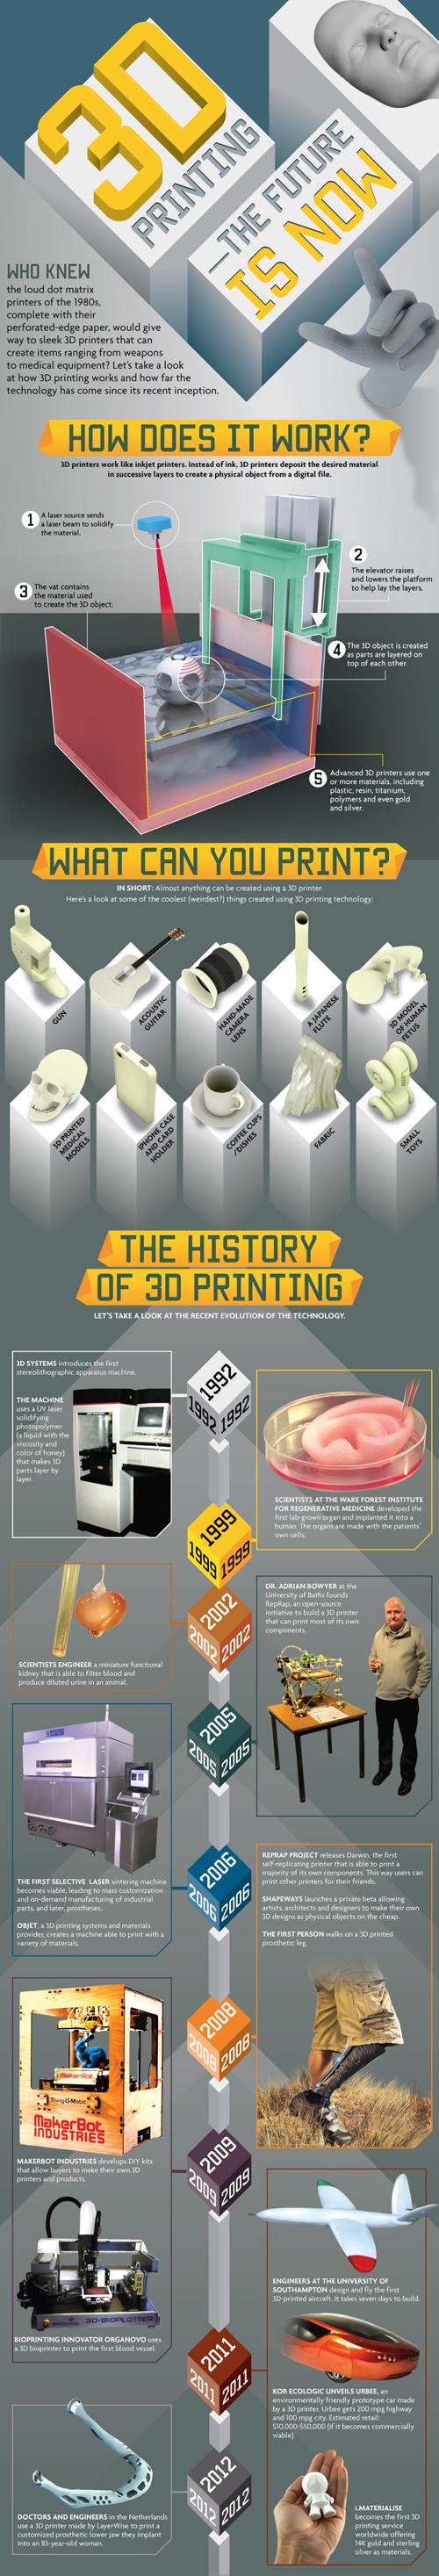 3d-printing5